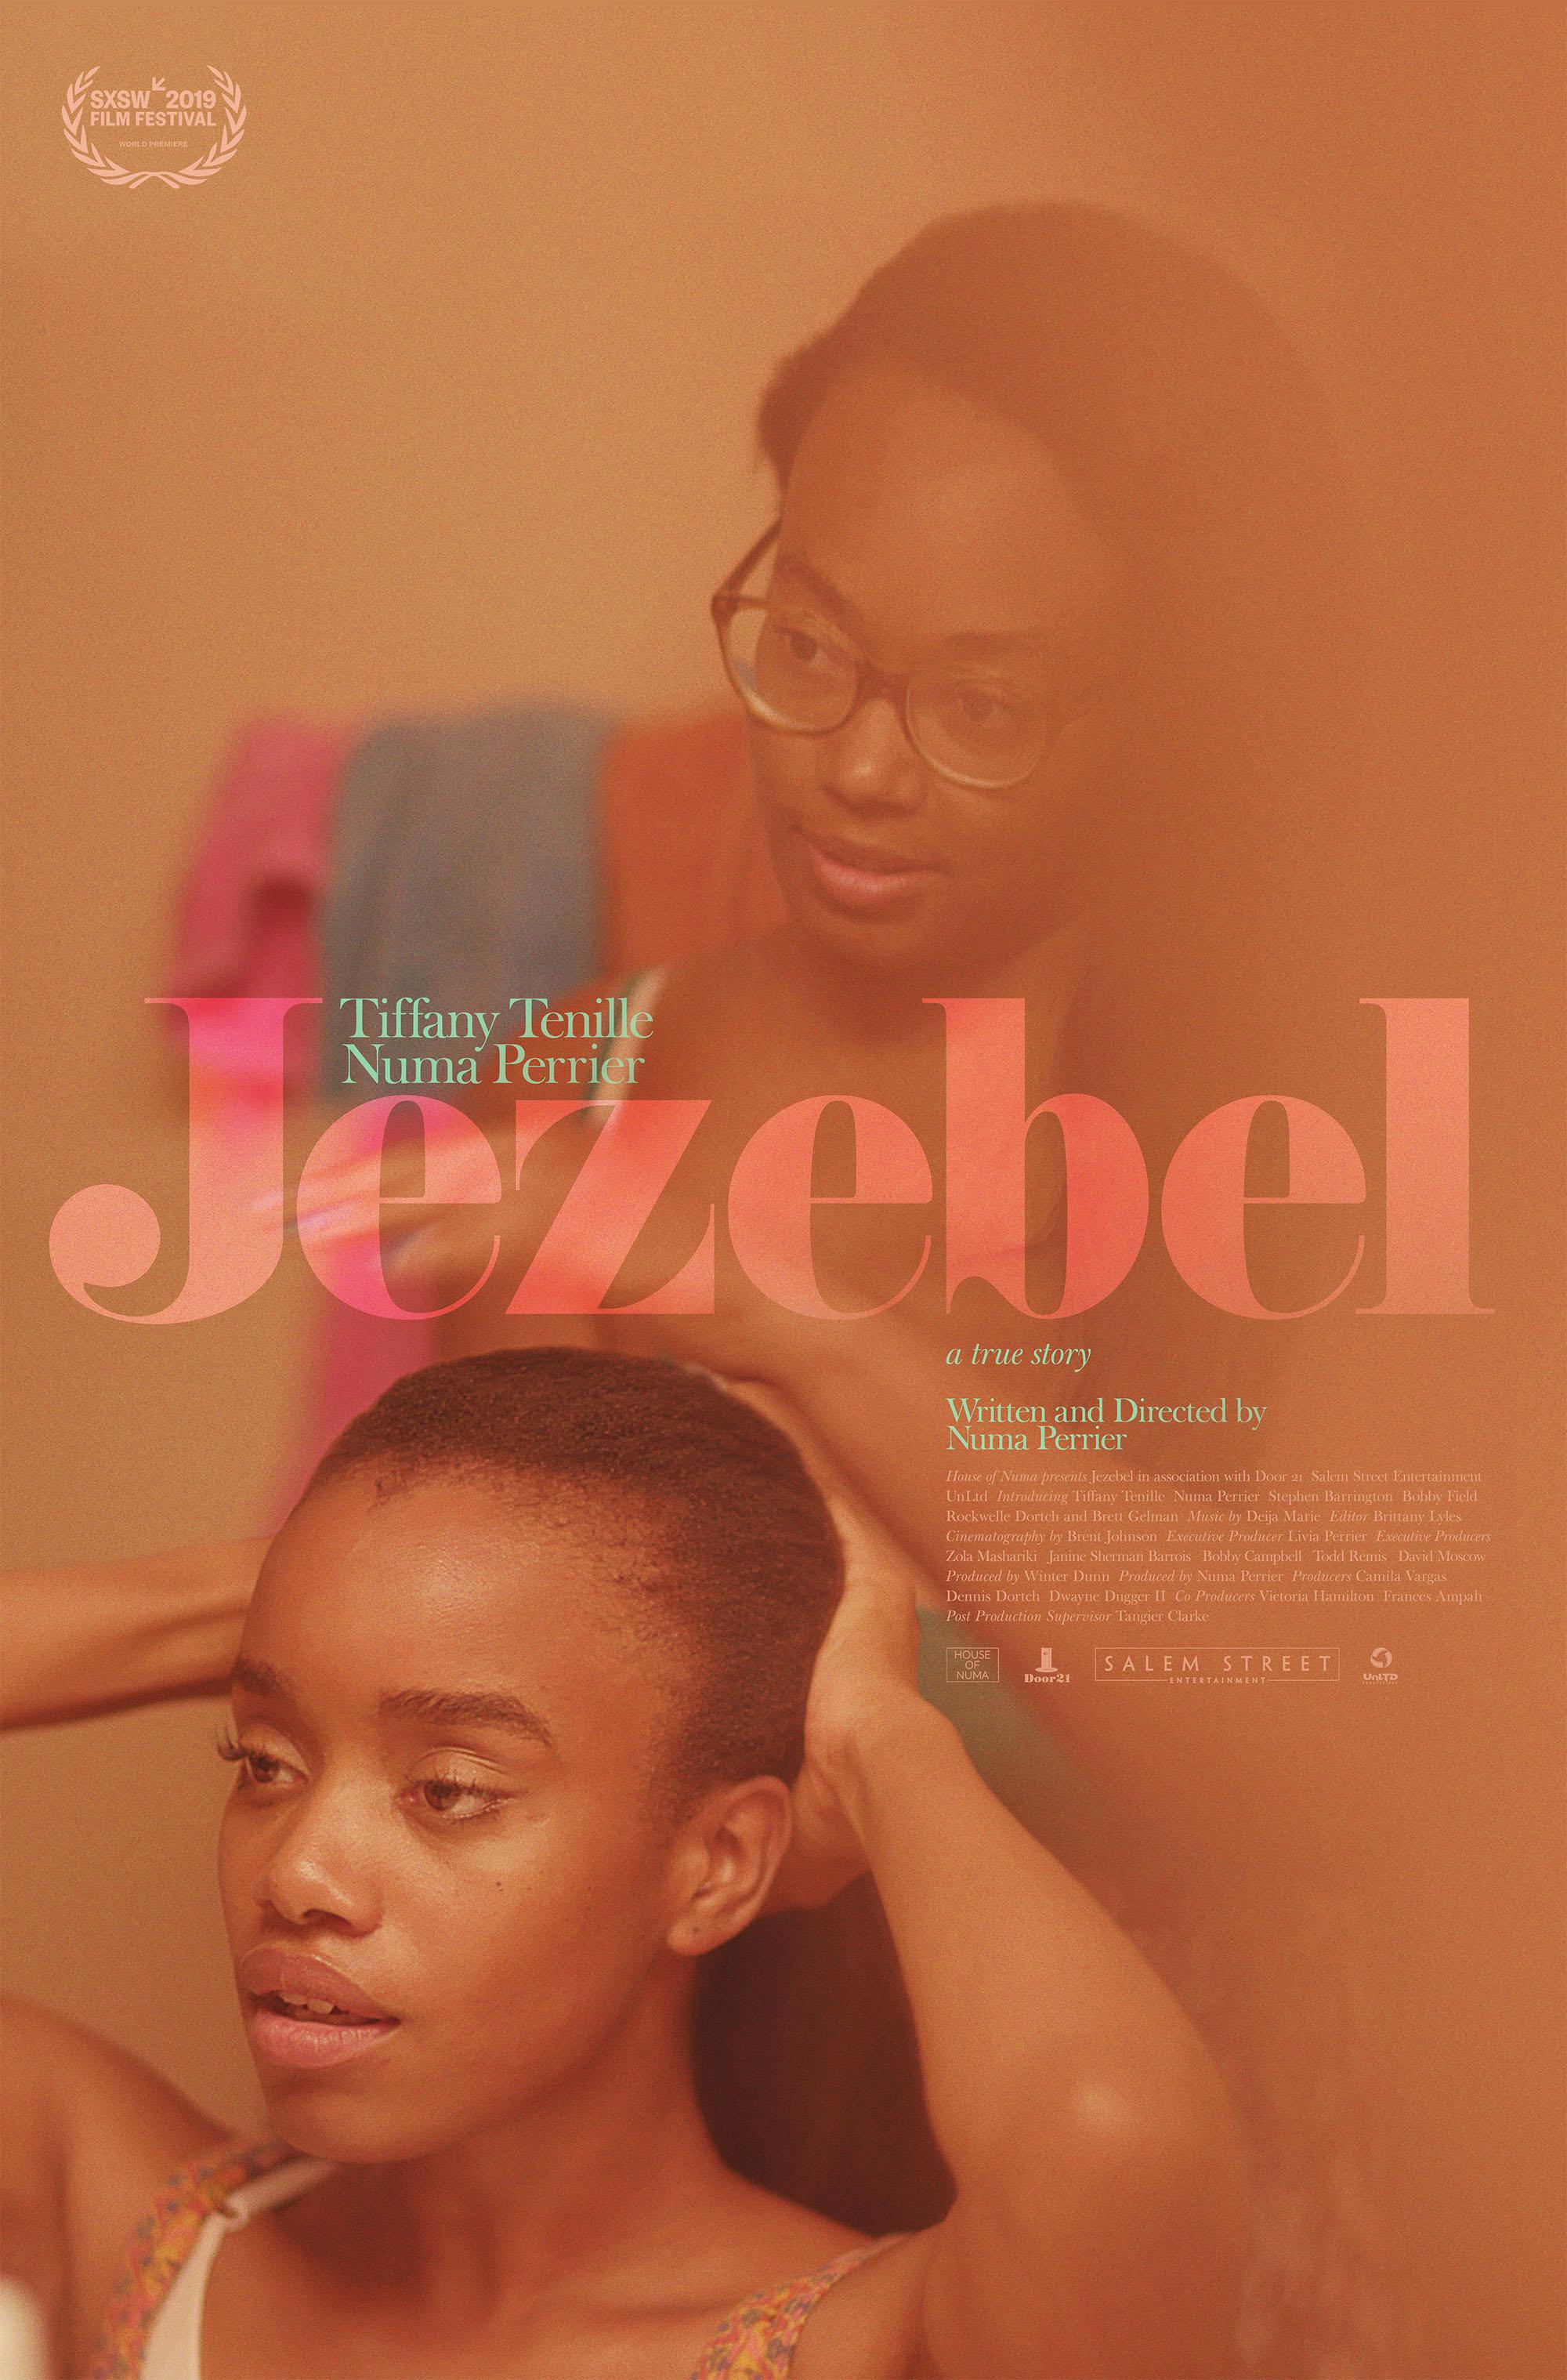 Jezebel_Poster_01_Final.jpg